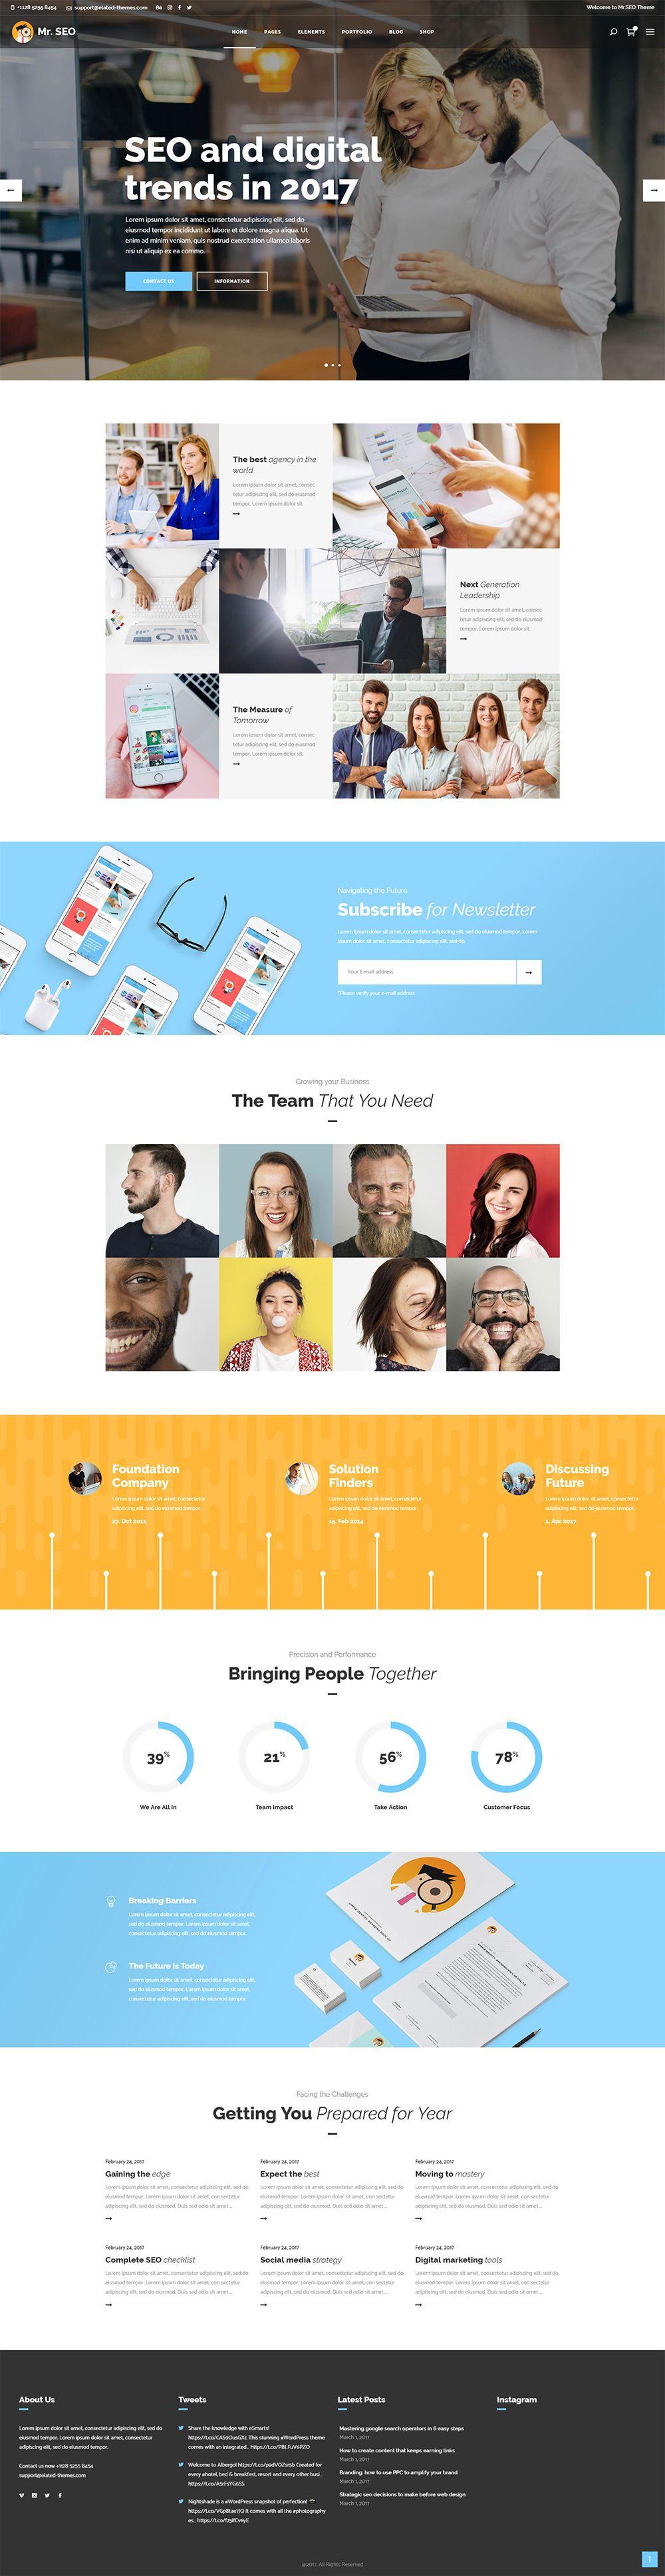 Display every detail of your agency in a beautiful way with Mr. SEO WordPress theme.  #wordpress #theme #webdesign #design #seo #marketing #digitalmarketing #marketingagency #startup #hosting #socialmedia